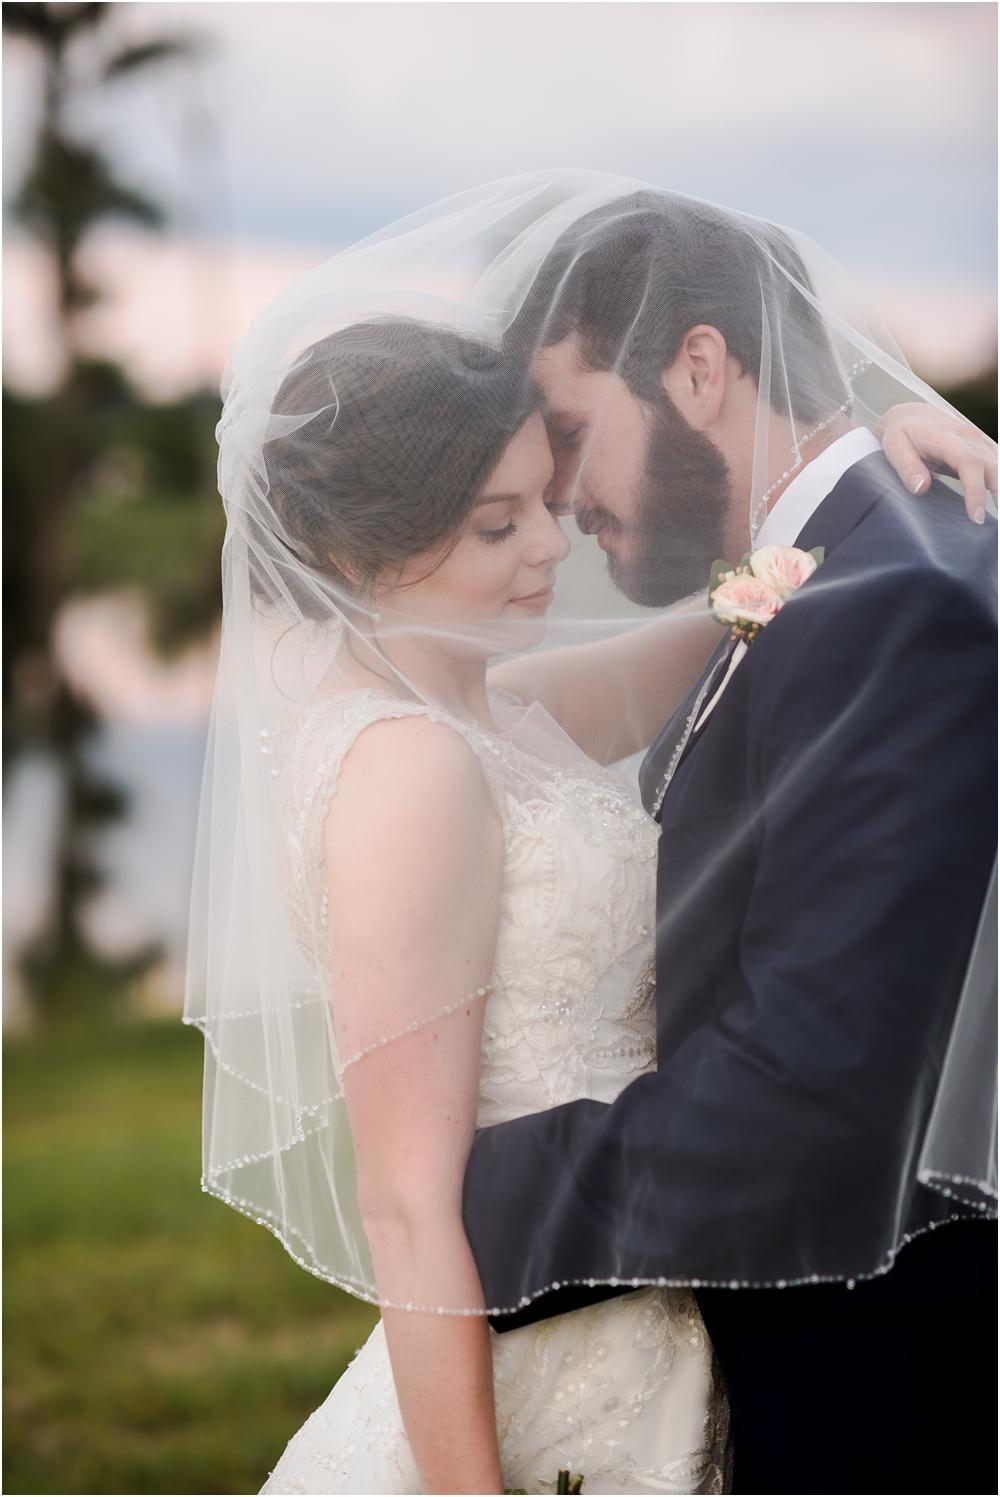 marianna-florida-wedding-photographer-kiersten-grant-157.jpg